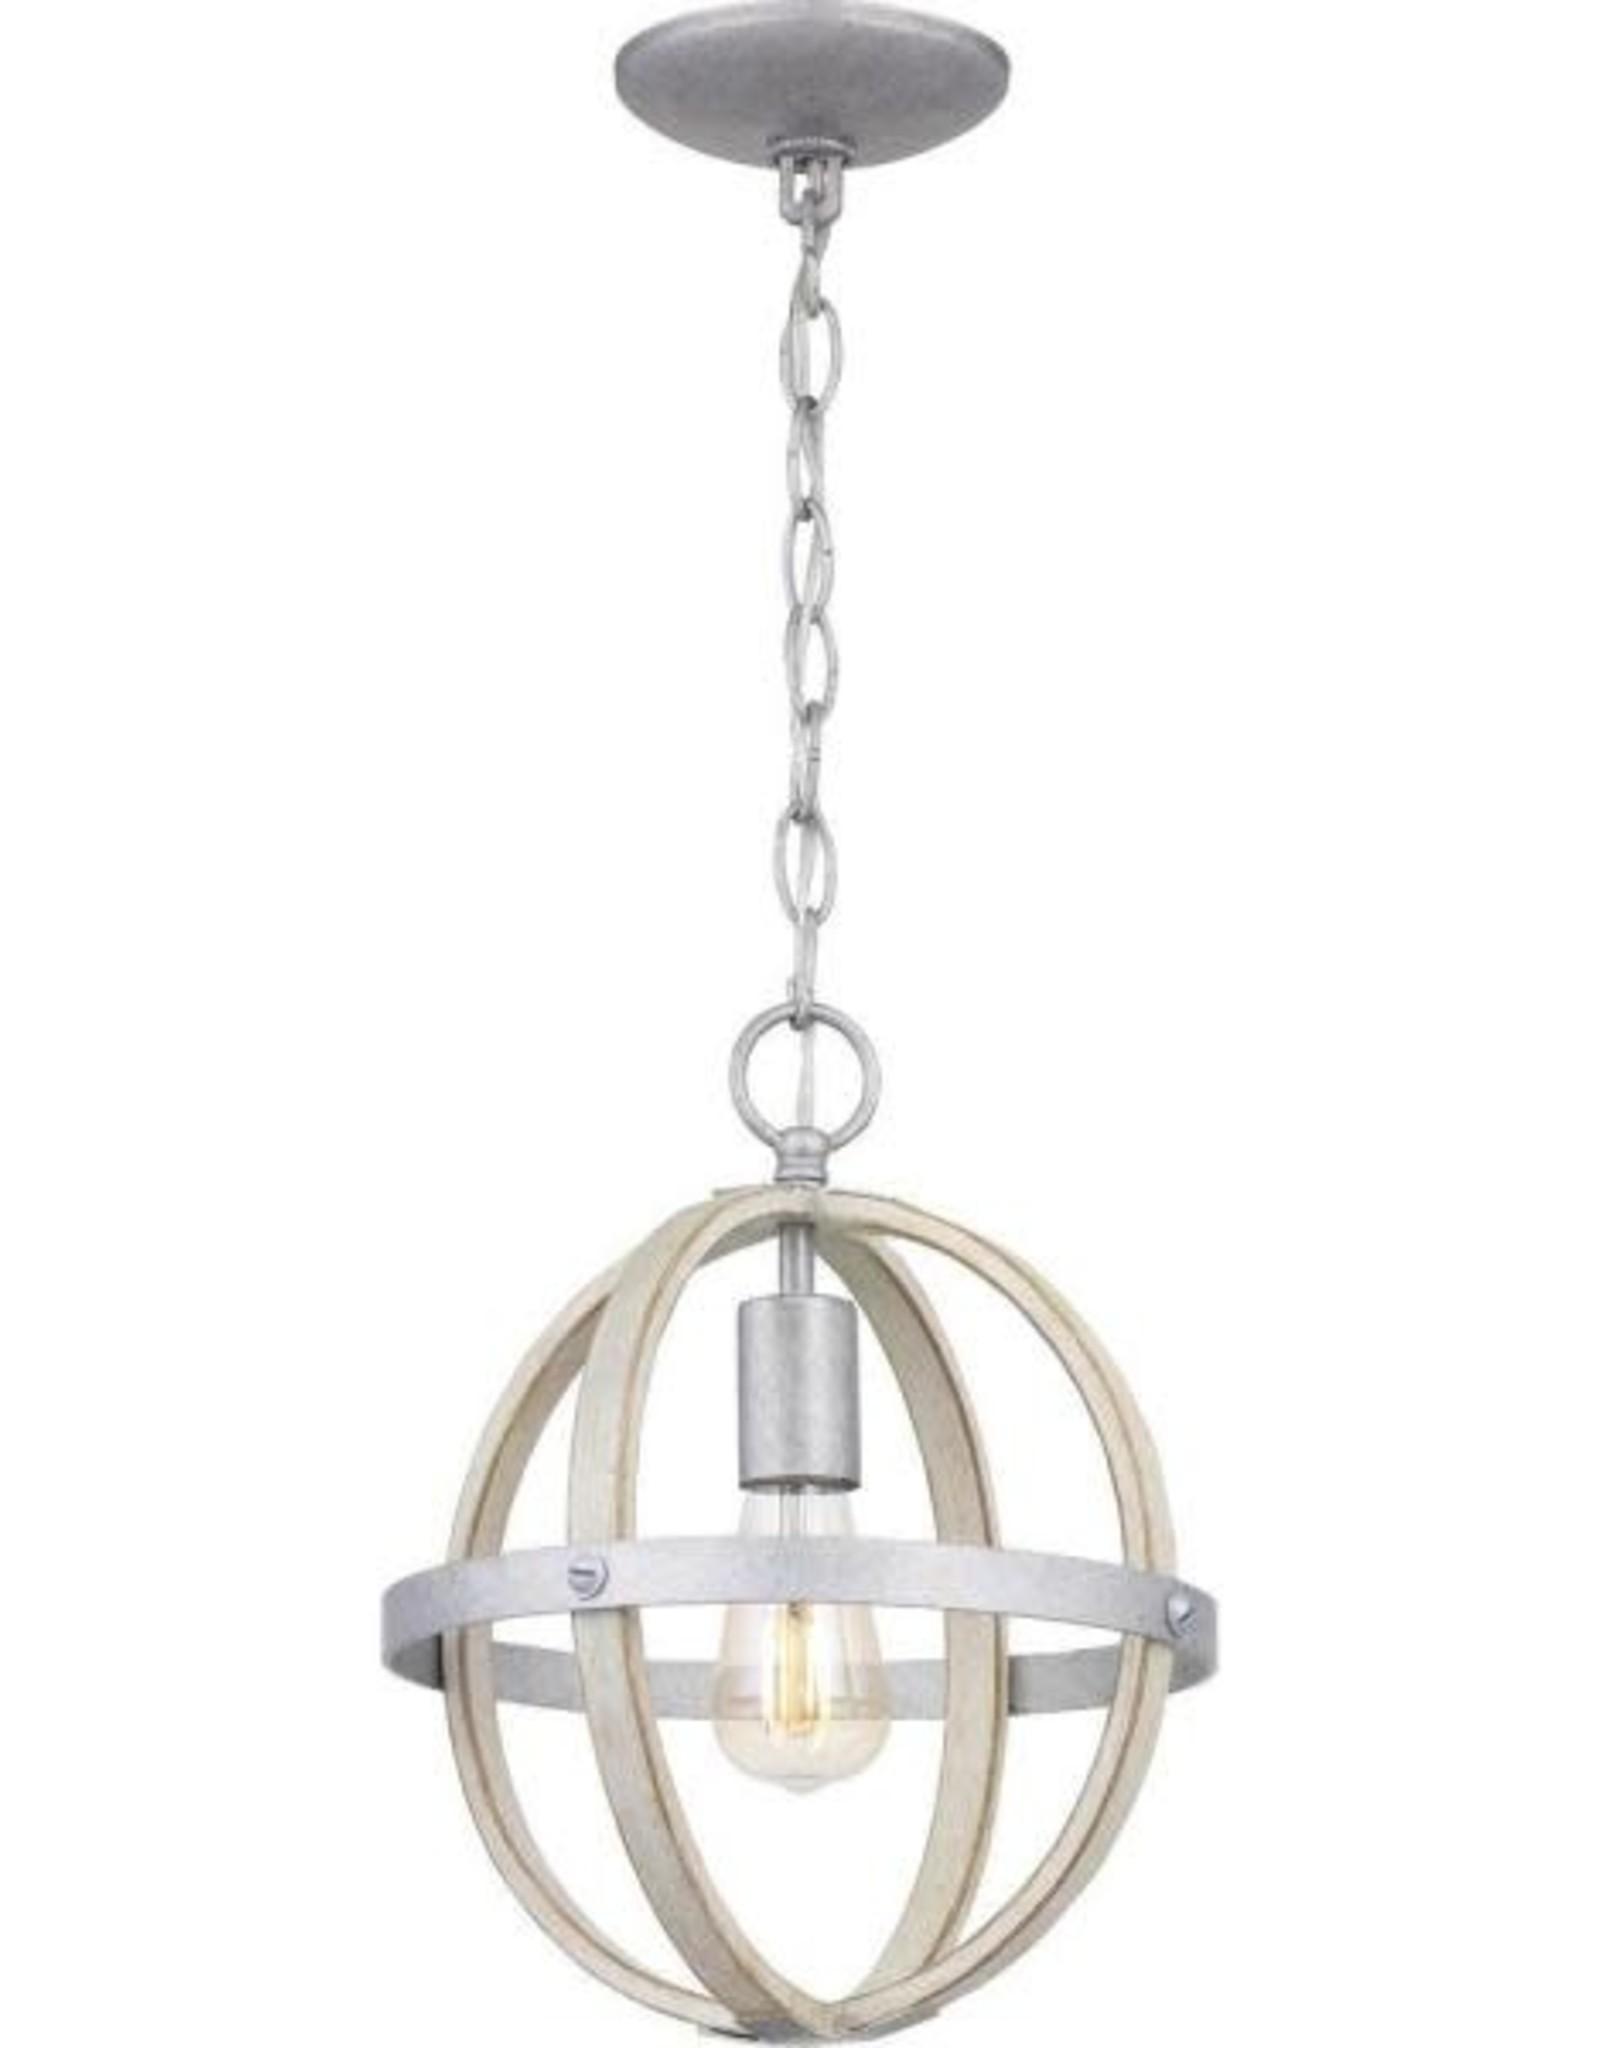 Progress Lighting Keowee 1-Light Galvanized Mini-Pendant with Antique White Wood Accents